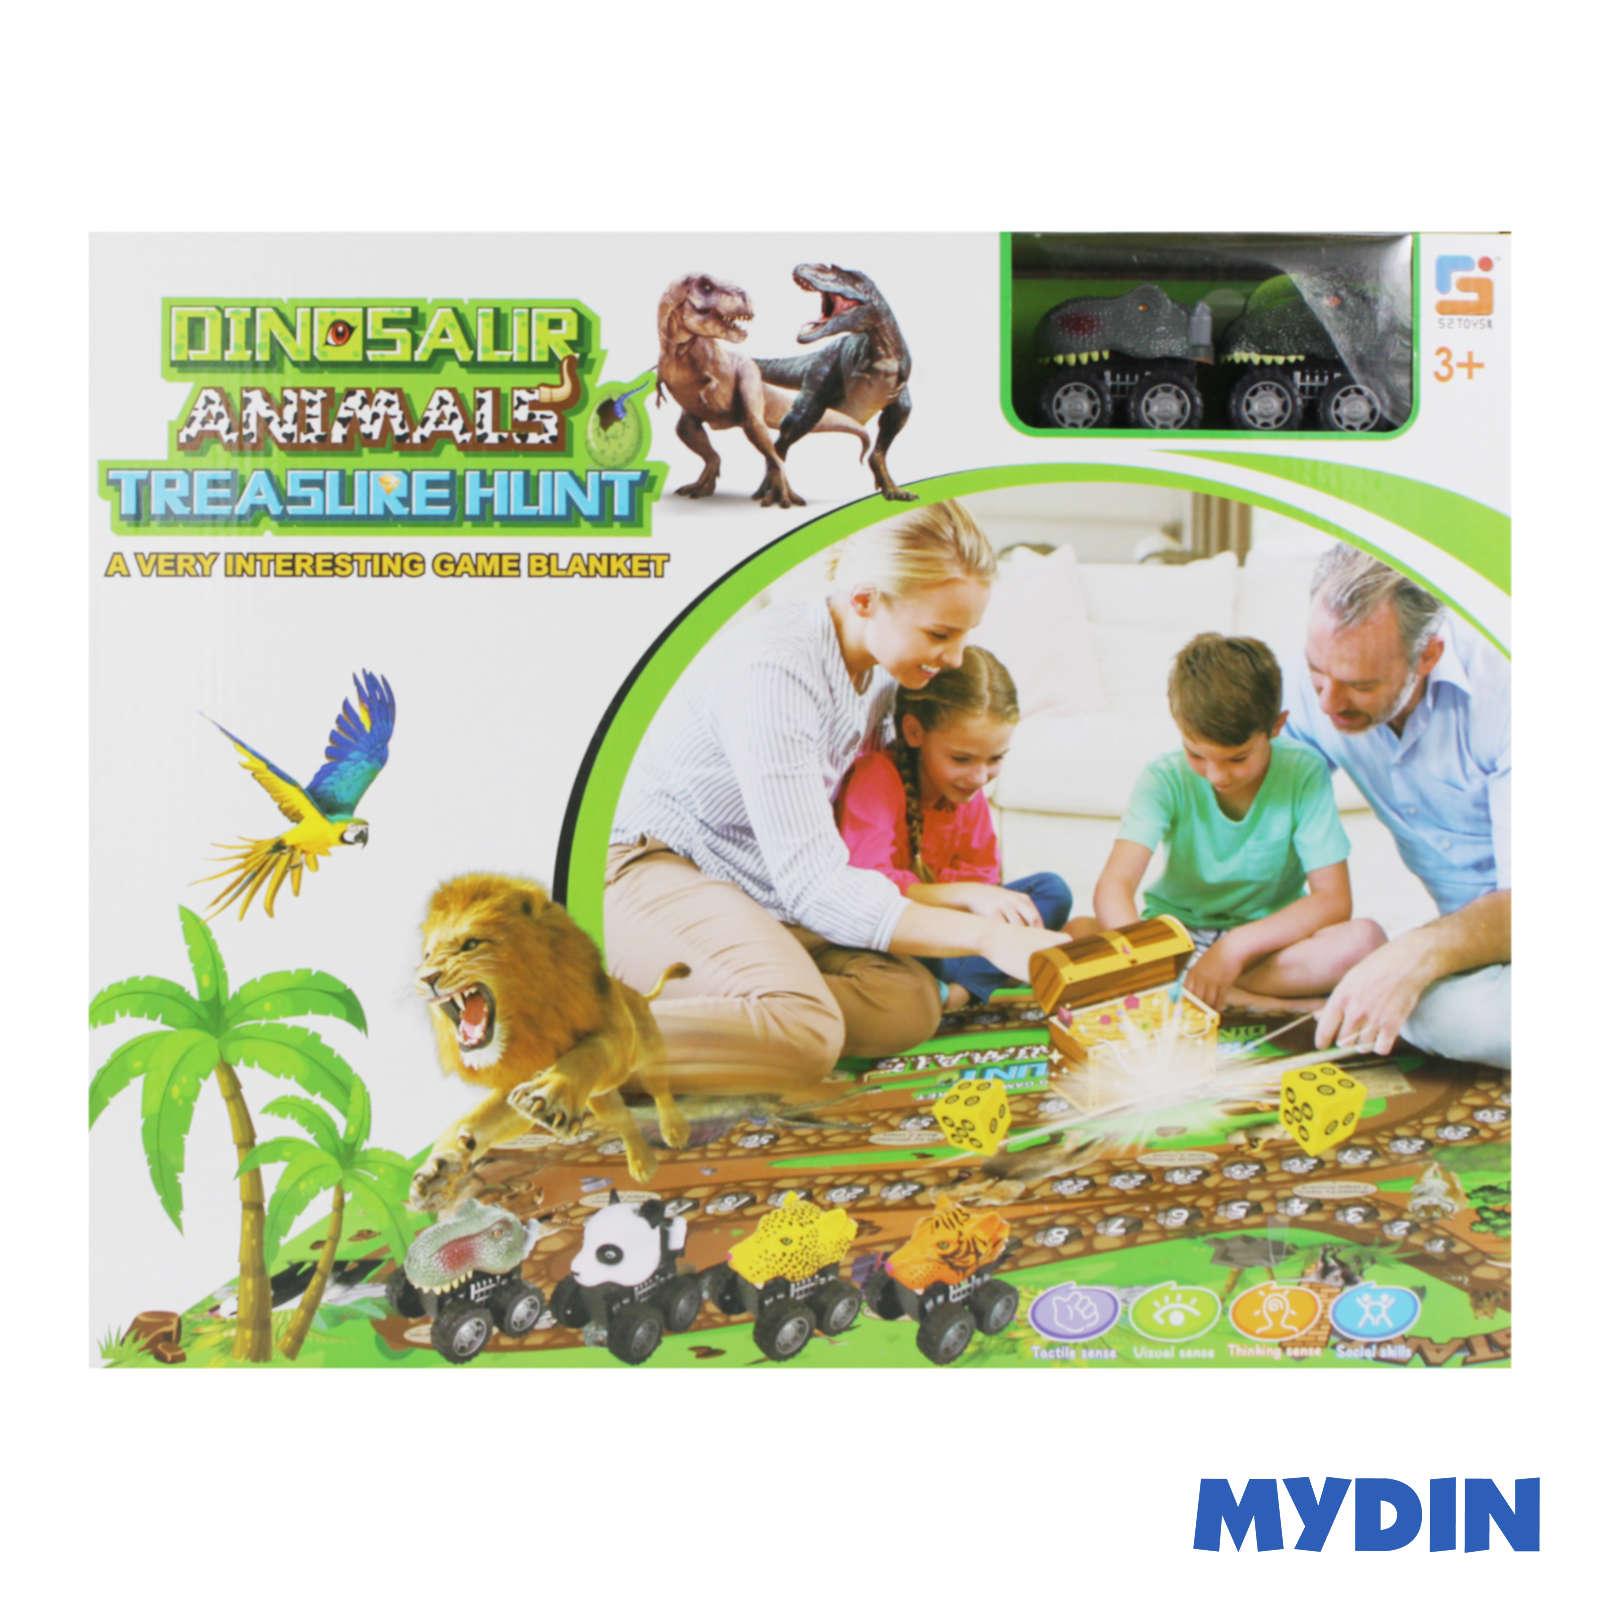 Dinosaur Treasure Hunt Toys (3years+) 526-J02-3760